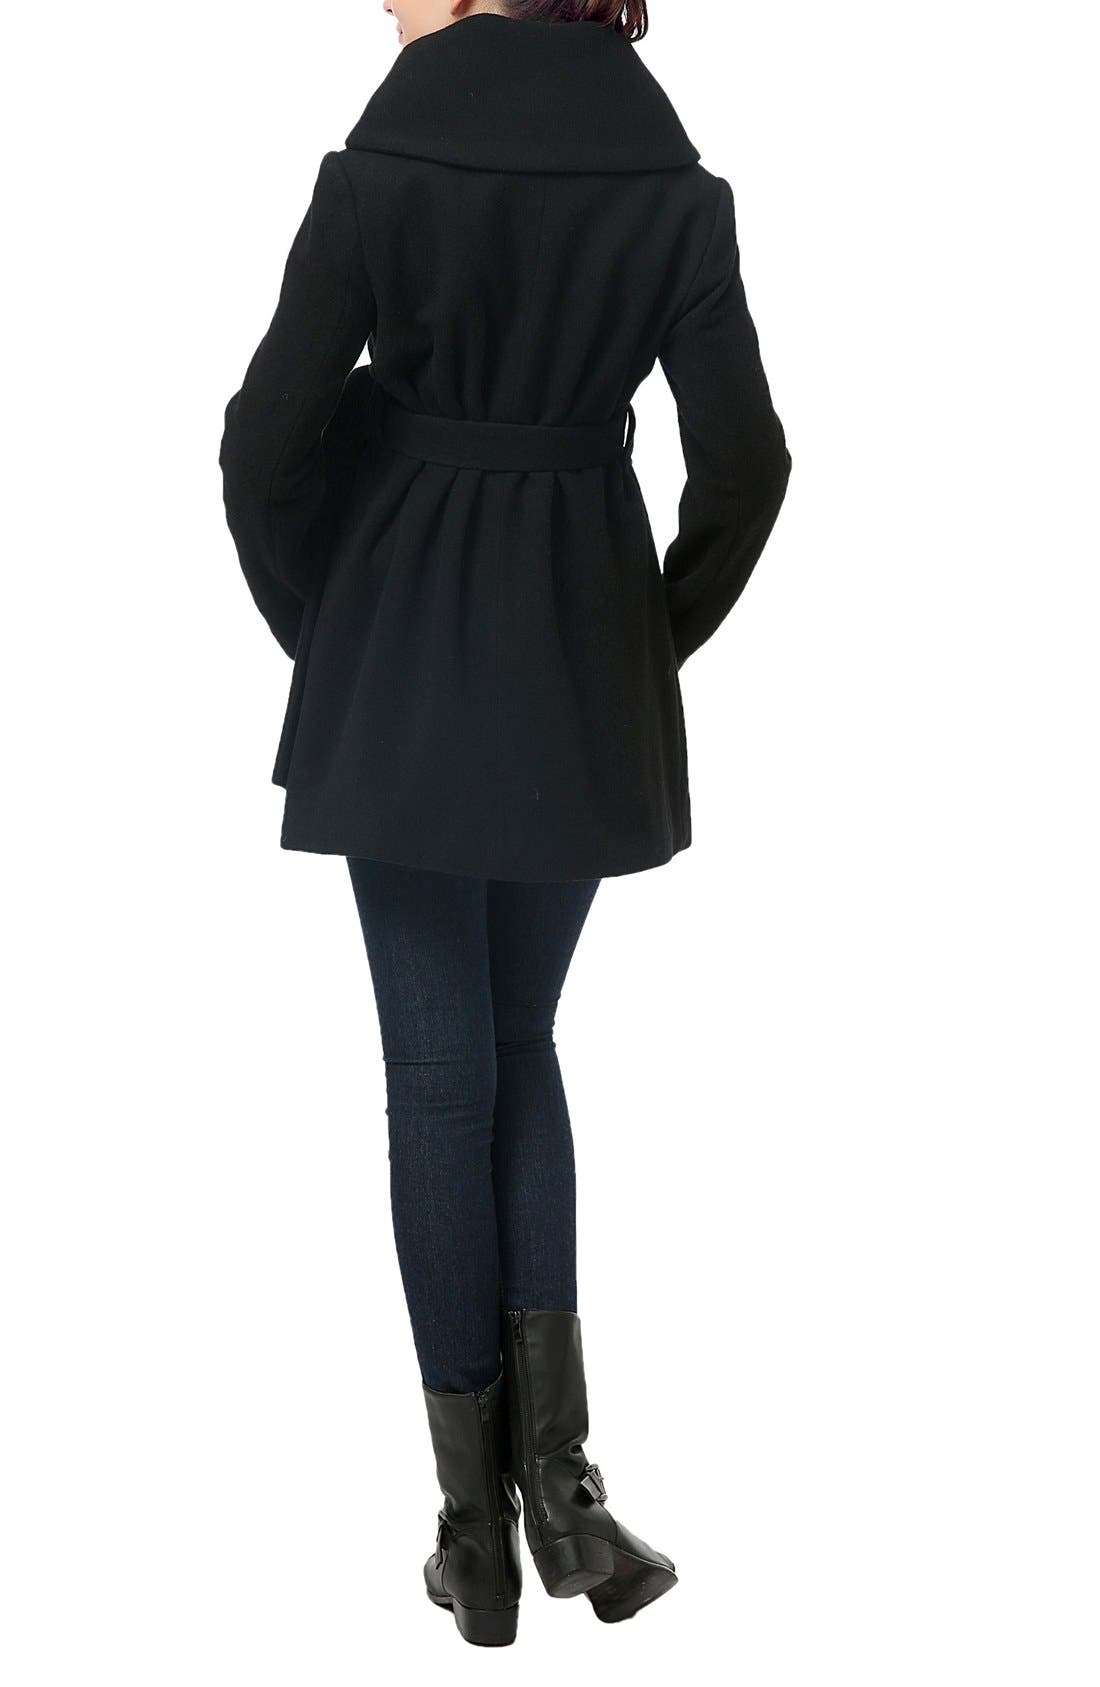 'Mia' High Collar Maternity Coat,                             Alternate thumbnail 2, color,                             001